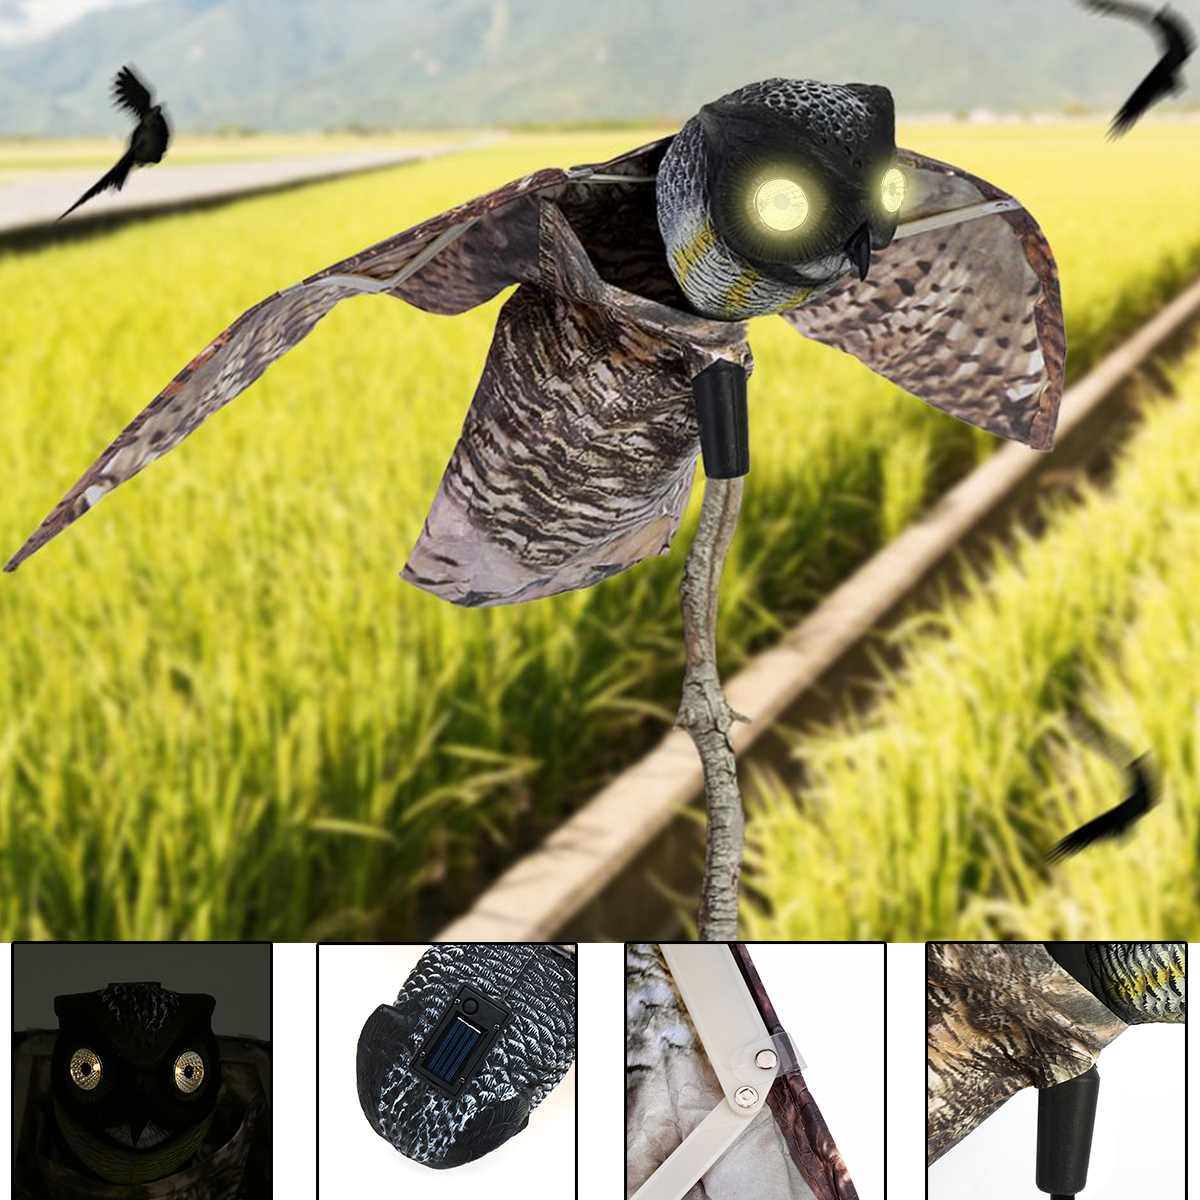 Bird Scarer Dynamic Moving Wings Realistic Plastic Fake Owl Decoy Pest Repellent Bird Scare Garden Yard Decor Outdoor Decoration